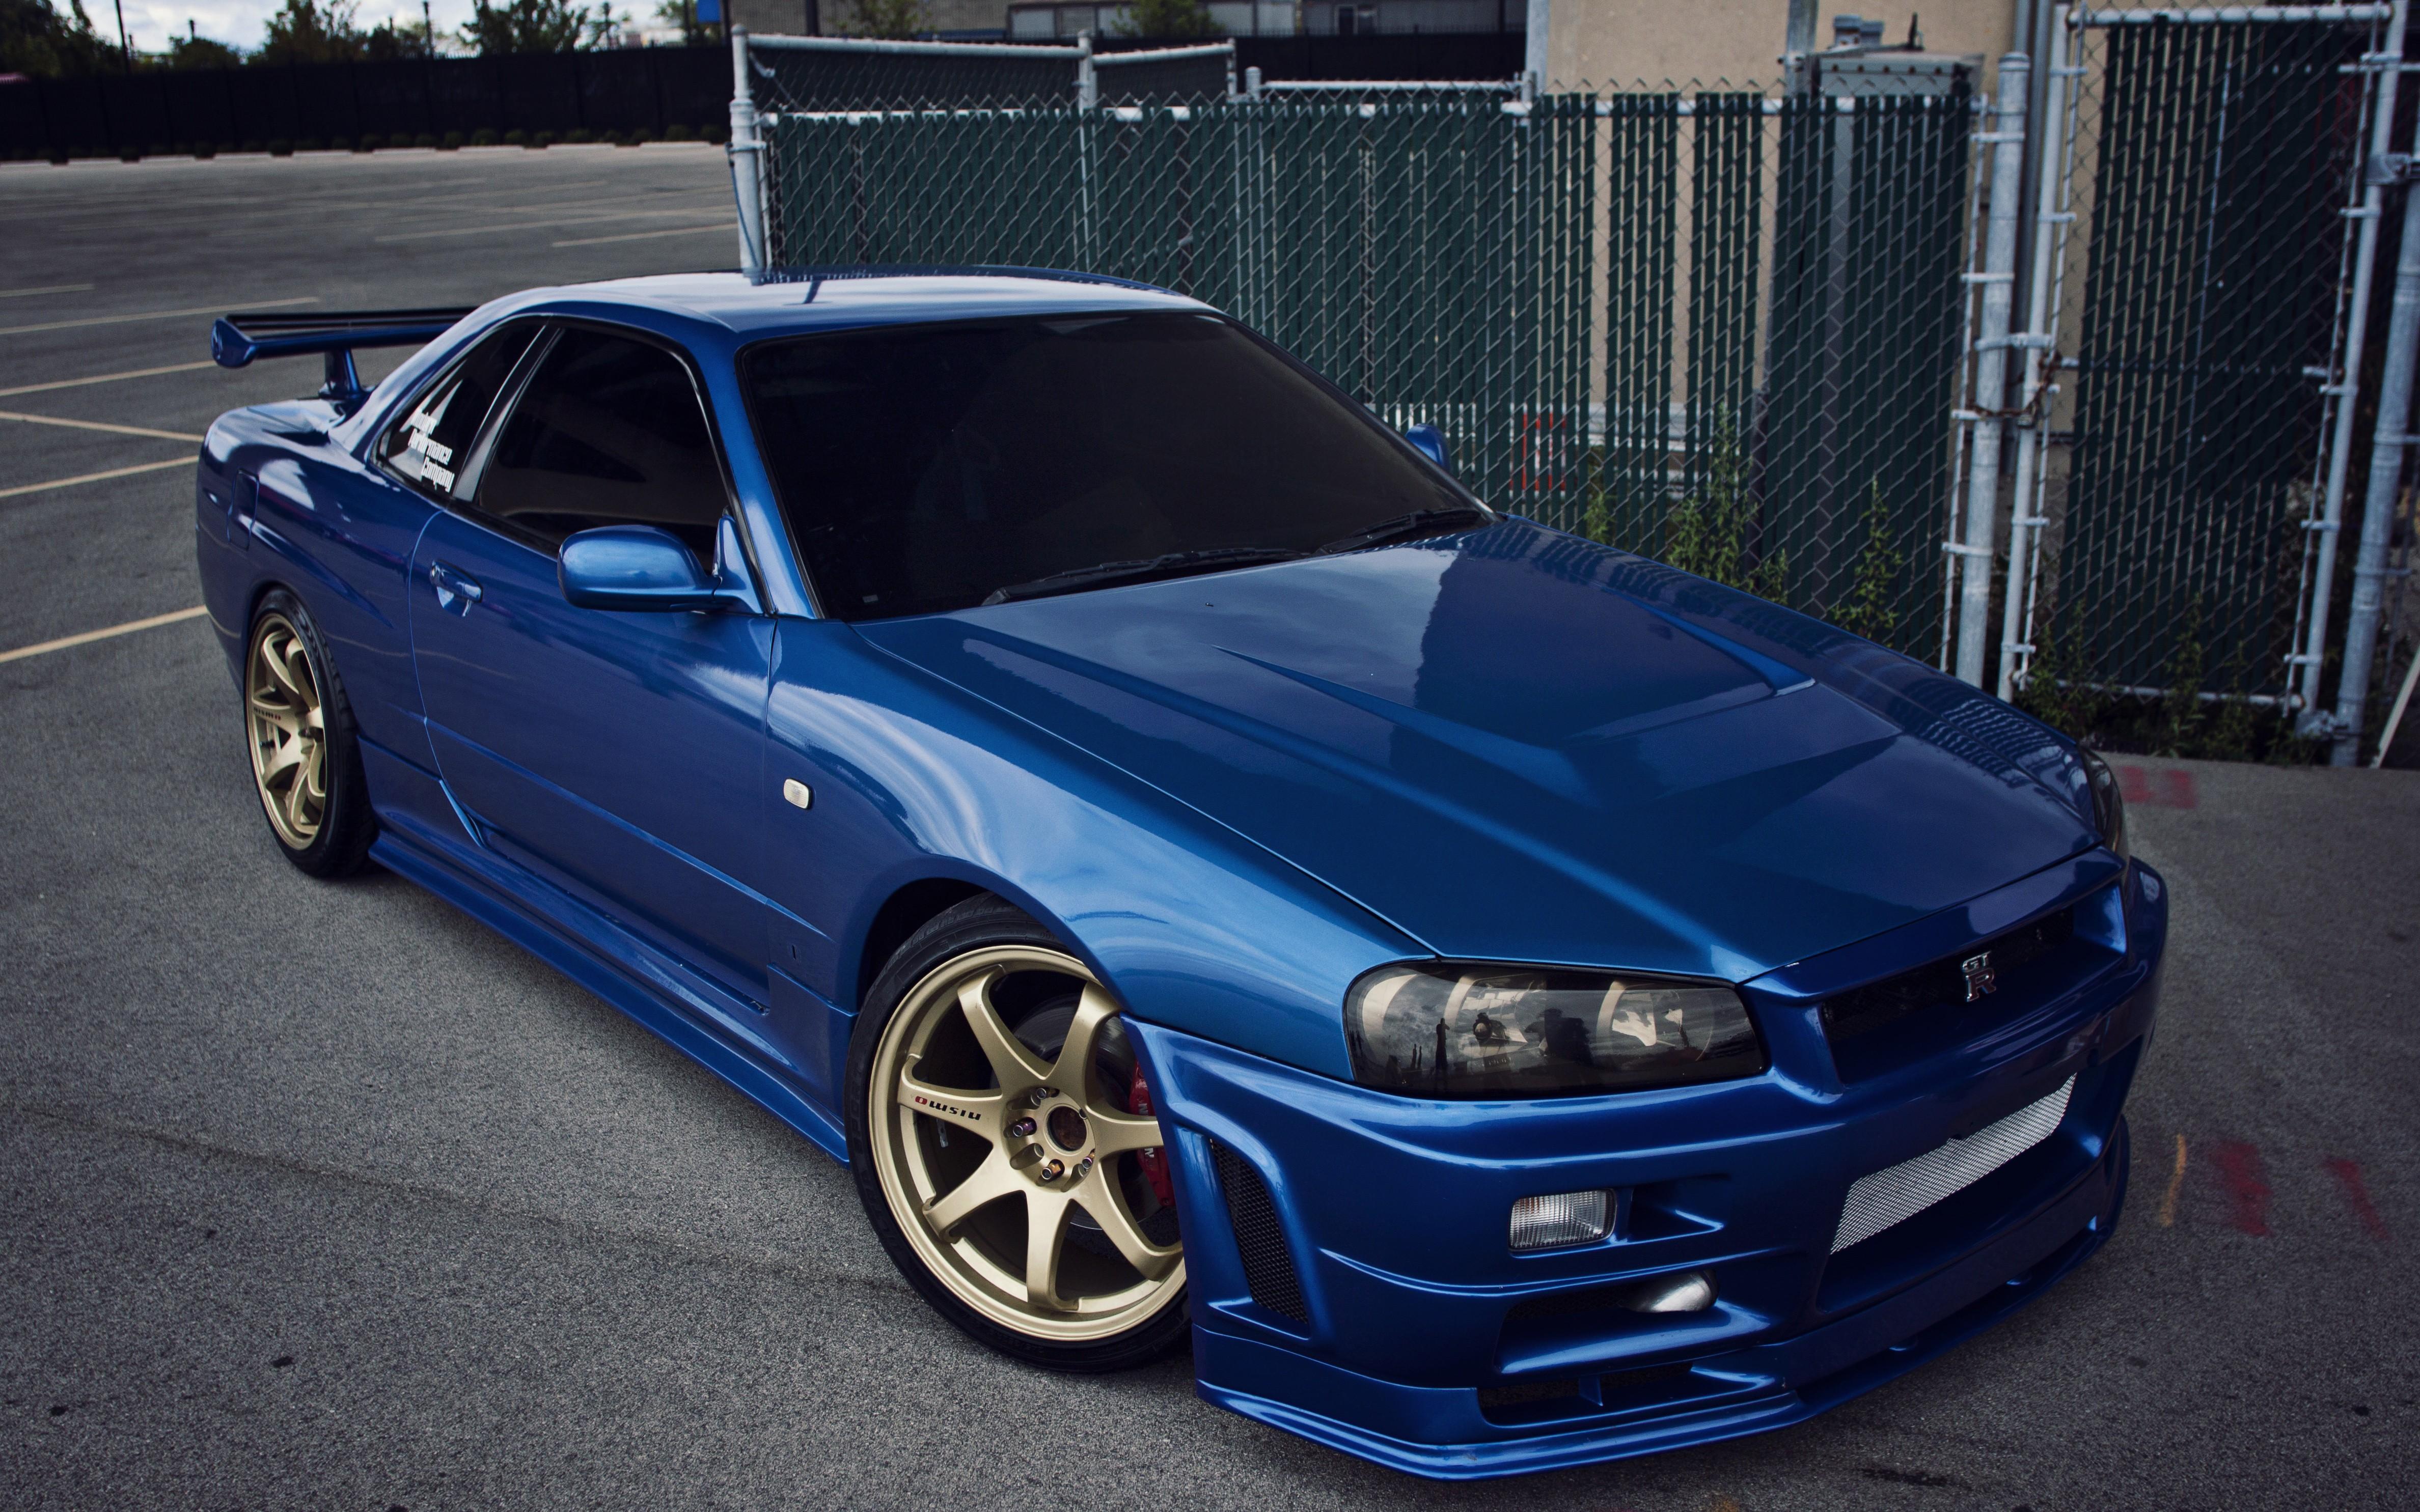 Wallpaper 4752x2970 Px Blue Cars Gt R Japan Jdm